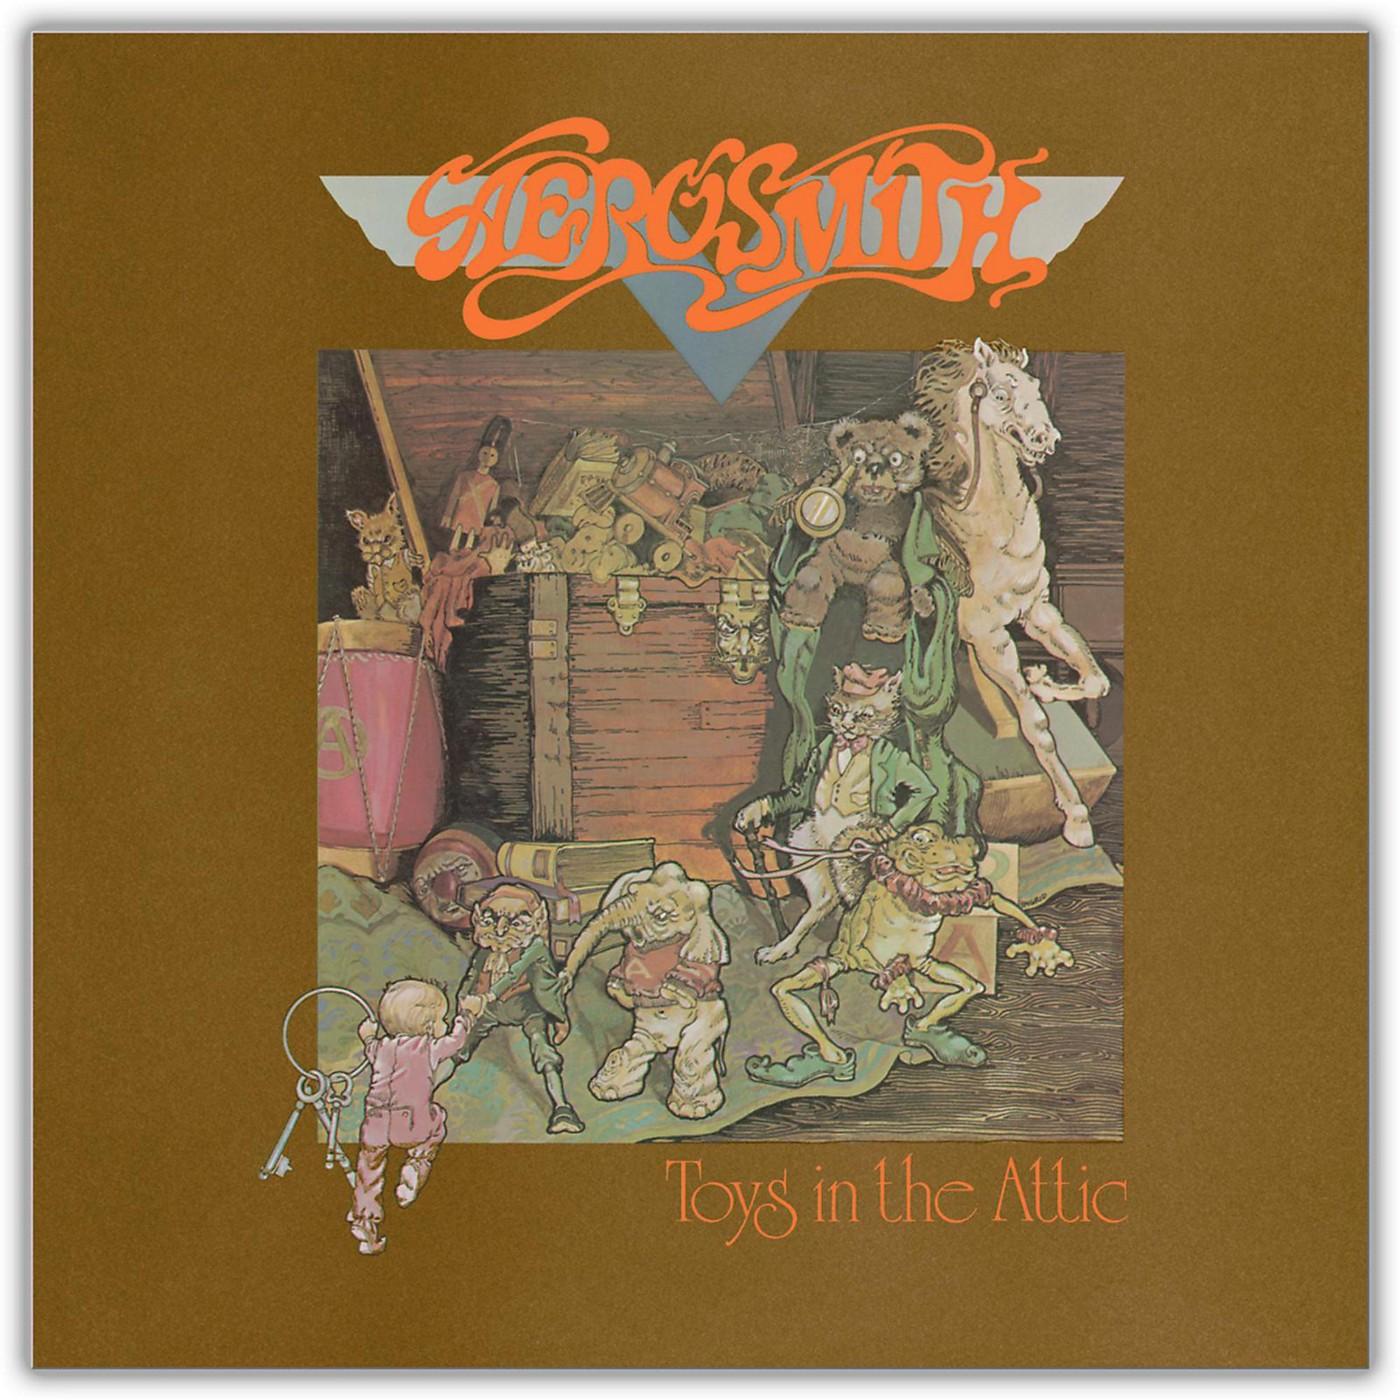 Sony Aerosmith - Toys in the Attic Vinyl LP thumbnail